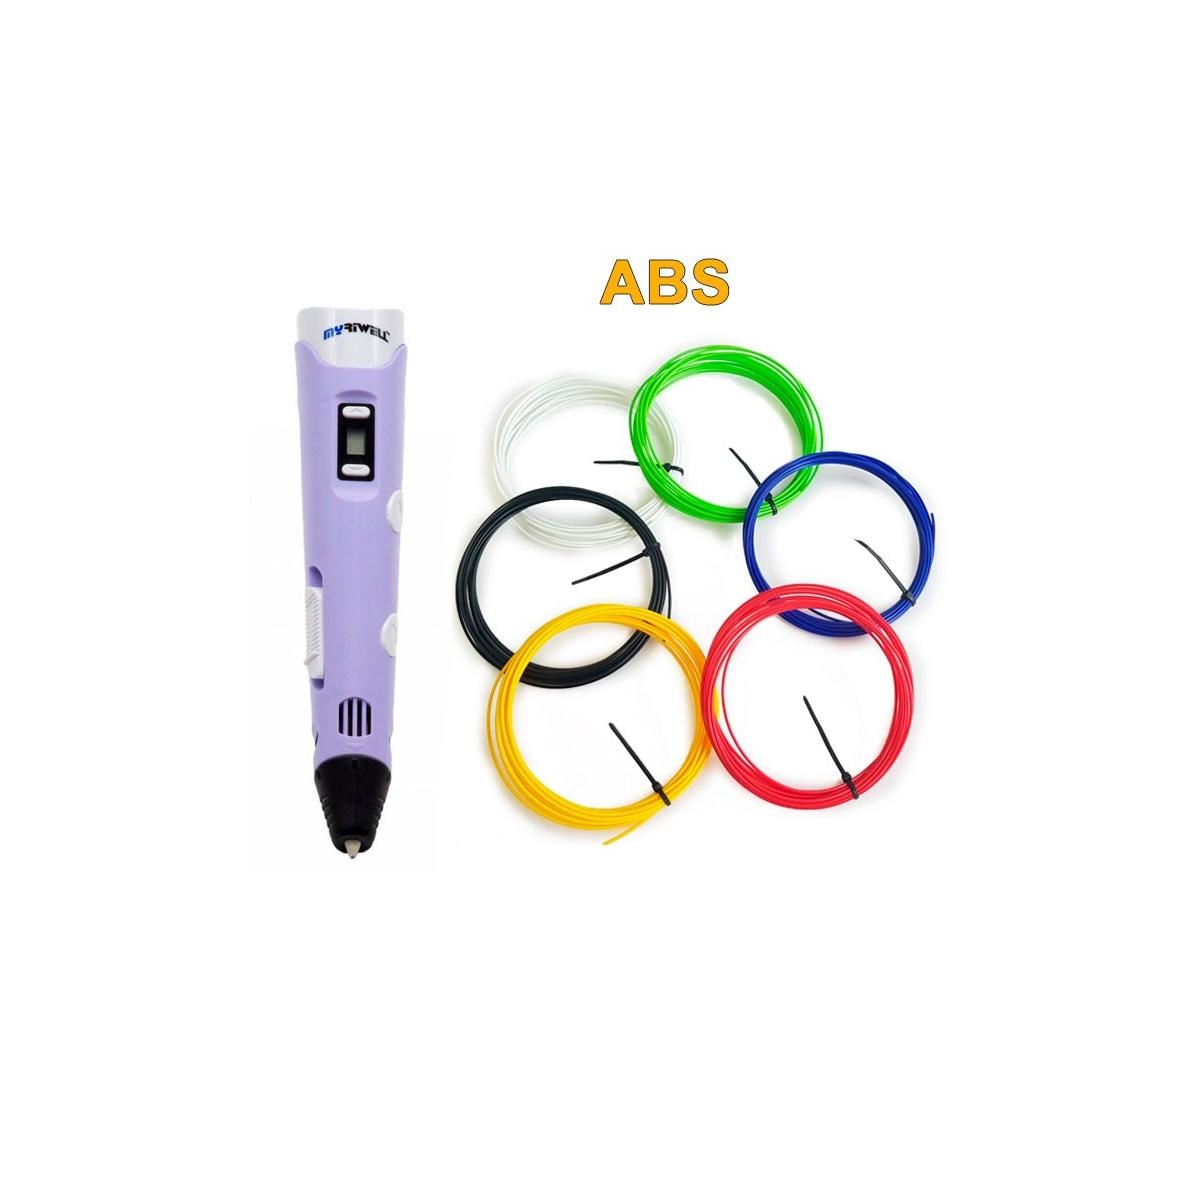 3D-Ручка MyRiwell RP-100B + 30 м ABS (6 цветов). Набор START.